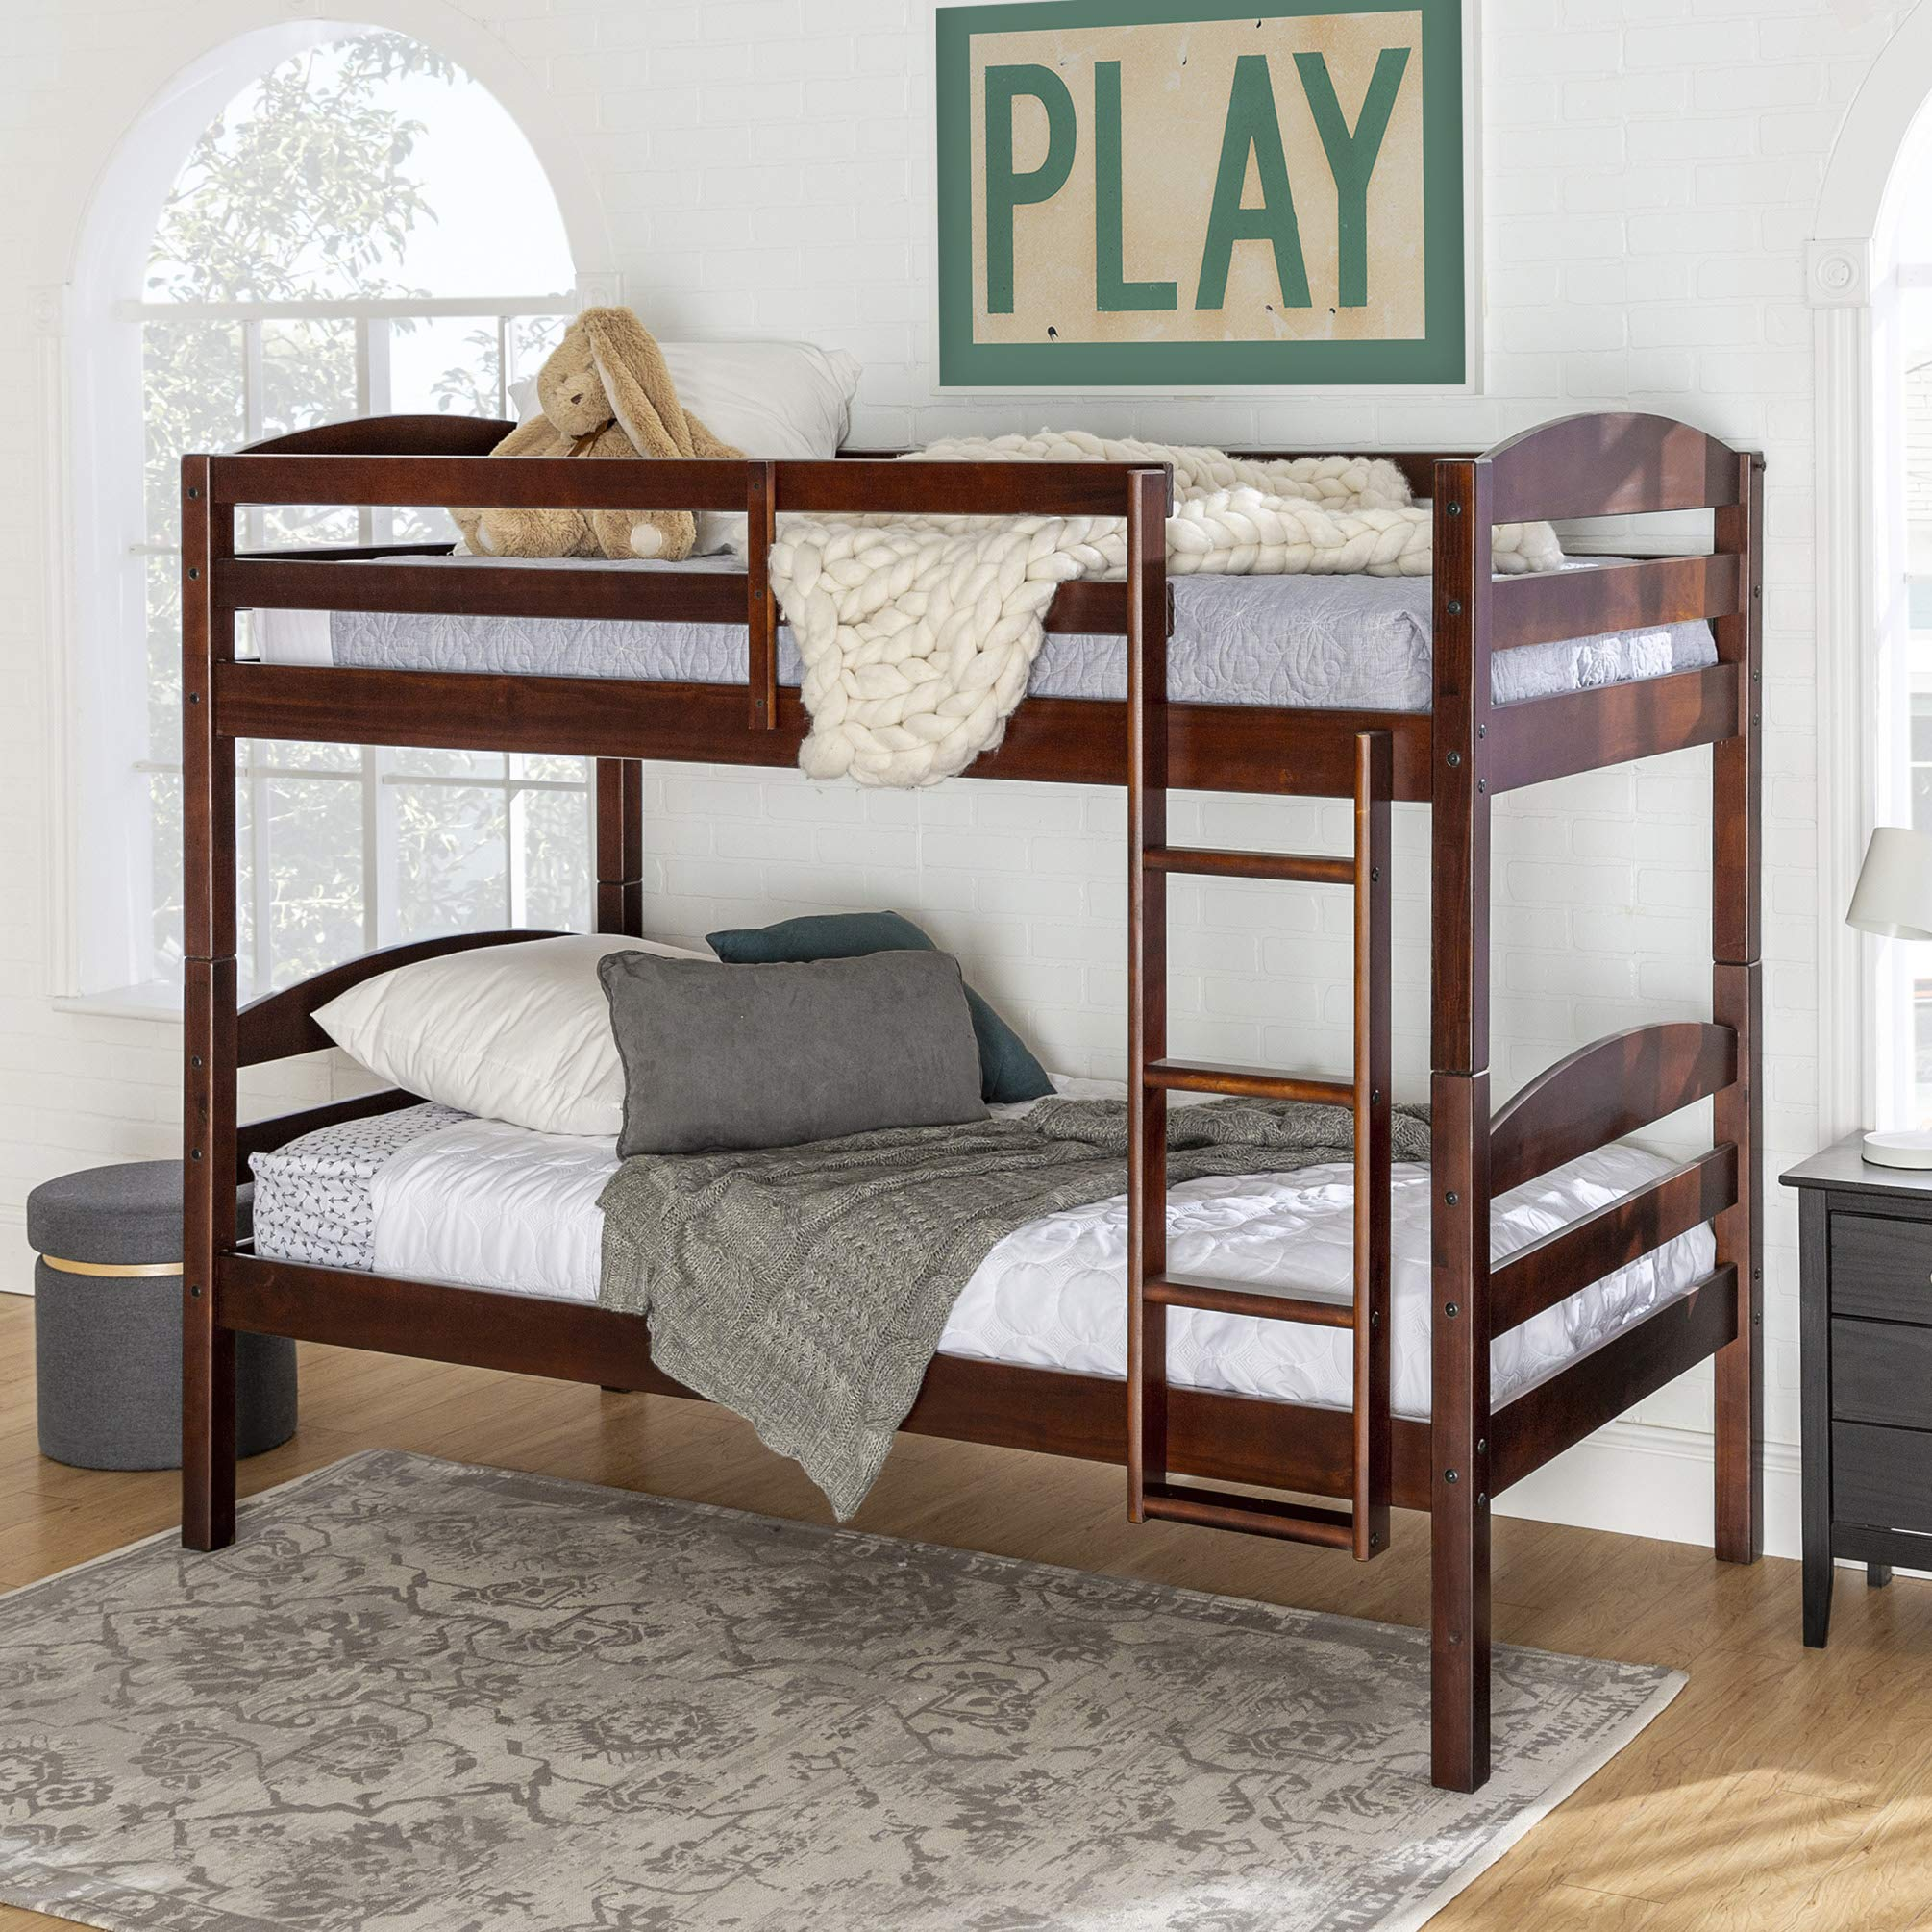 Walker Edison Della Classic Solid Wood Twin over Twin Bunk Bed, Twin over Twin, Espresso